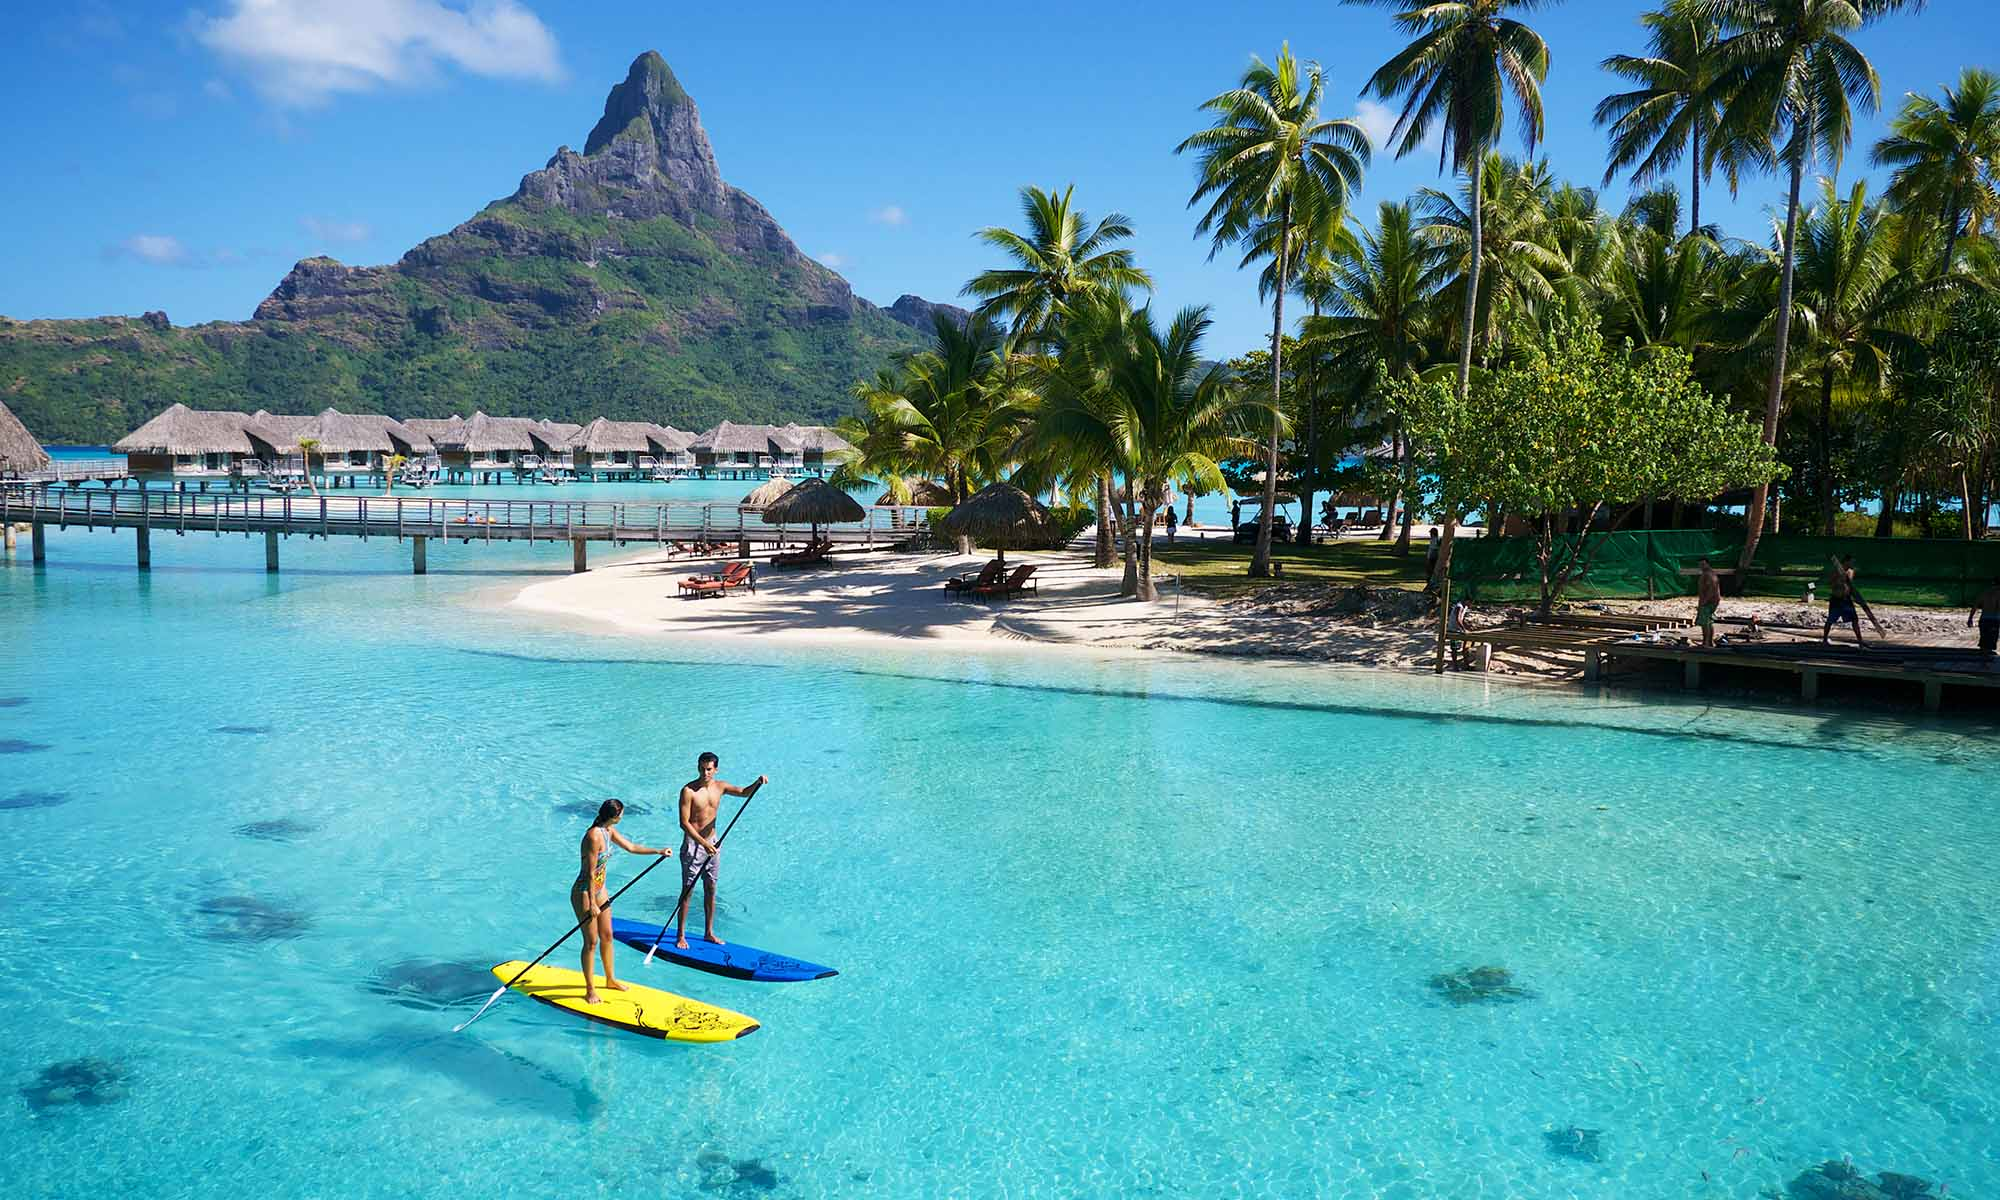 Image Result For Tahiti And Bora Bora New Tahiti French Polynesia Beautiful Fotos Of Tropical